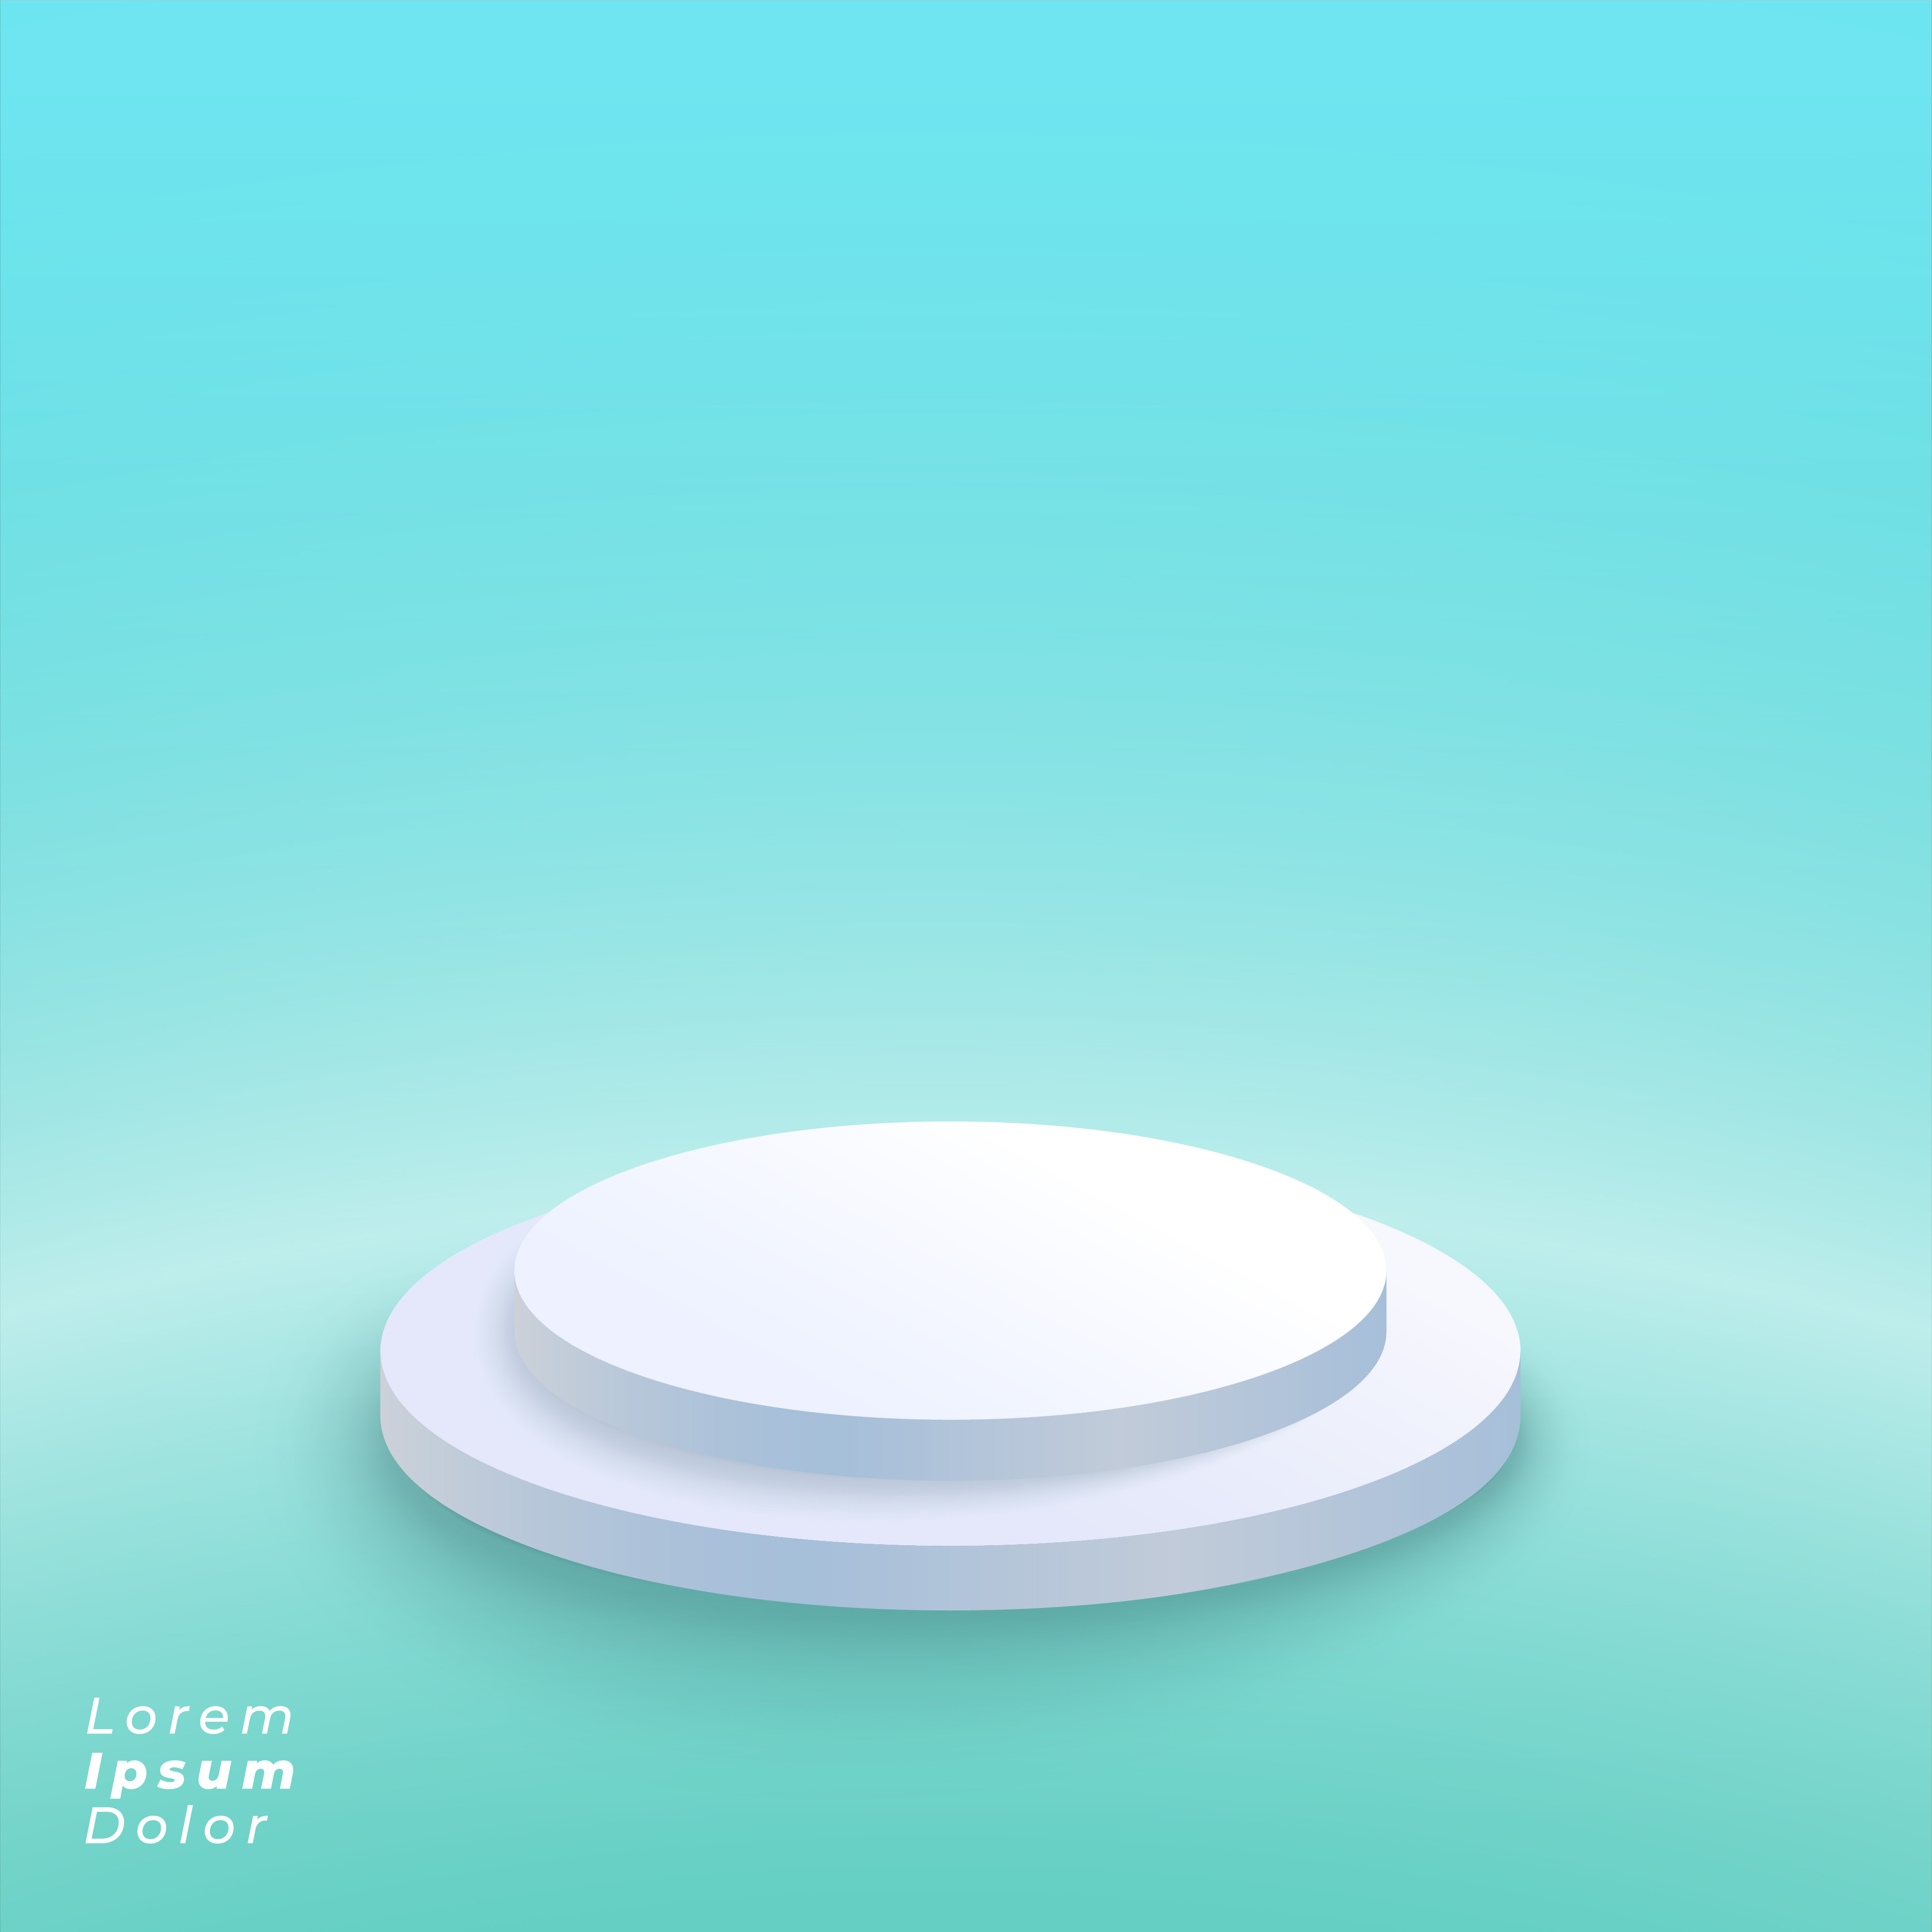 White Studio Background With Podium: Podium Platform On Blue Studio Background